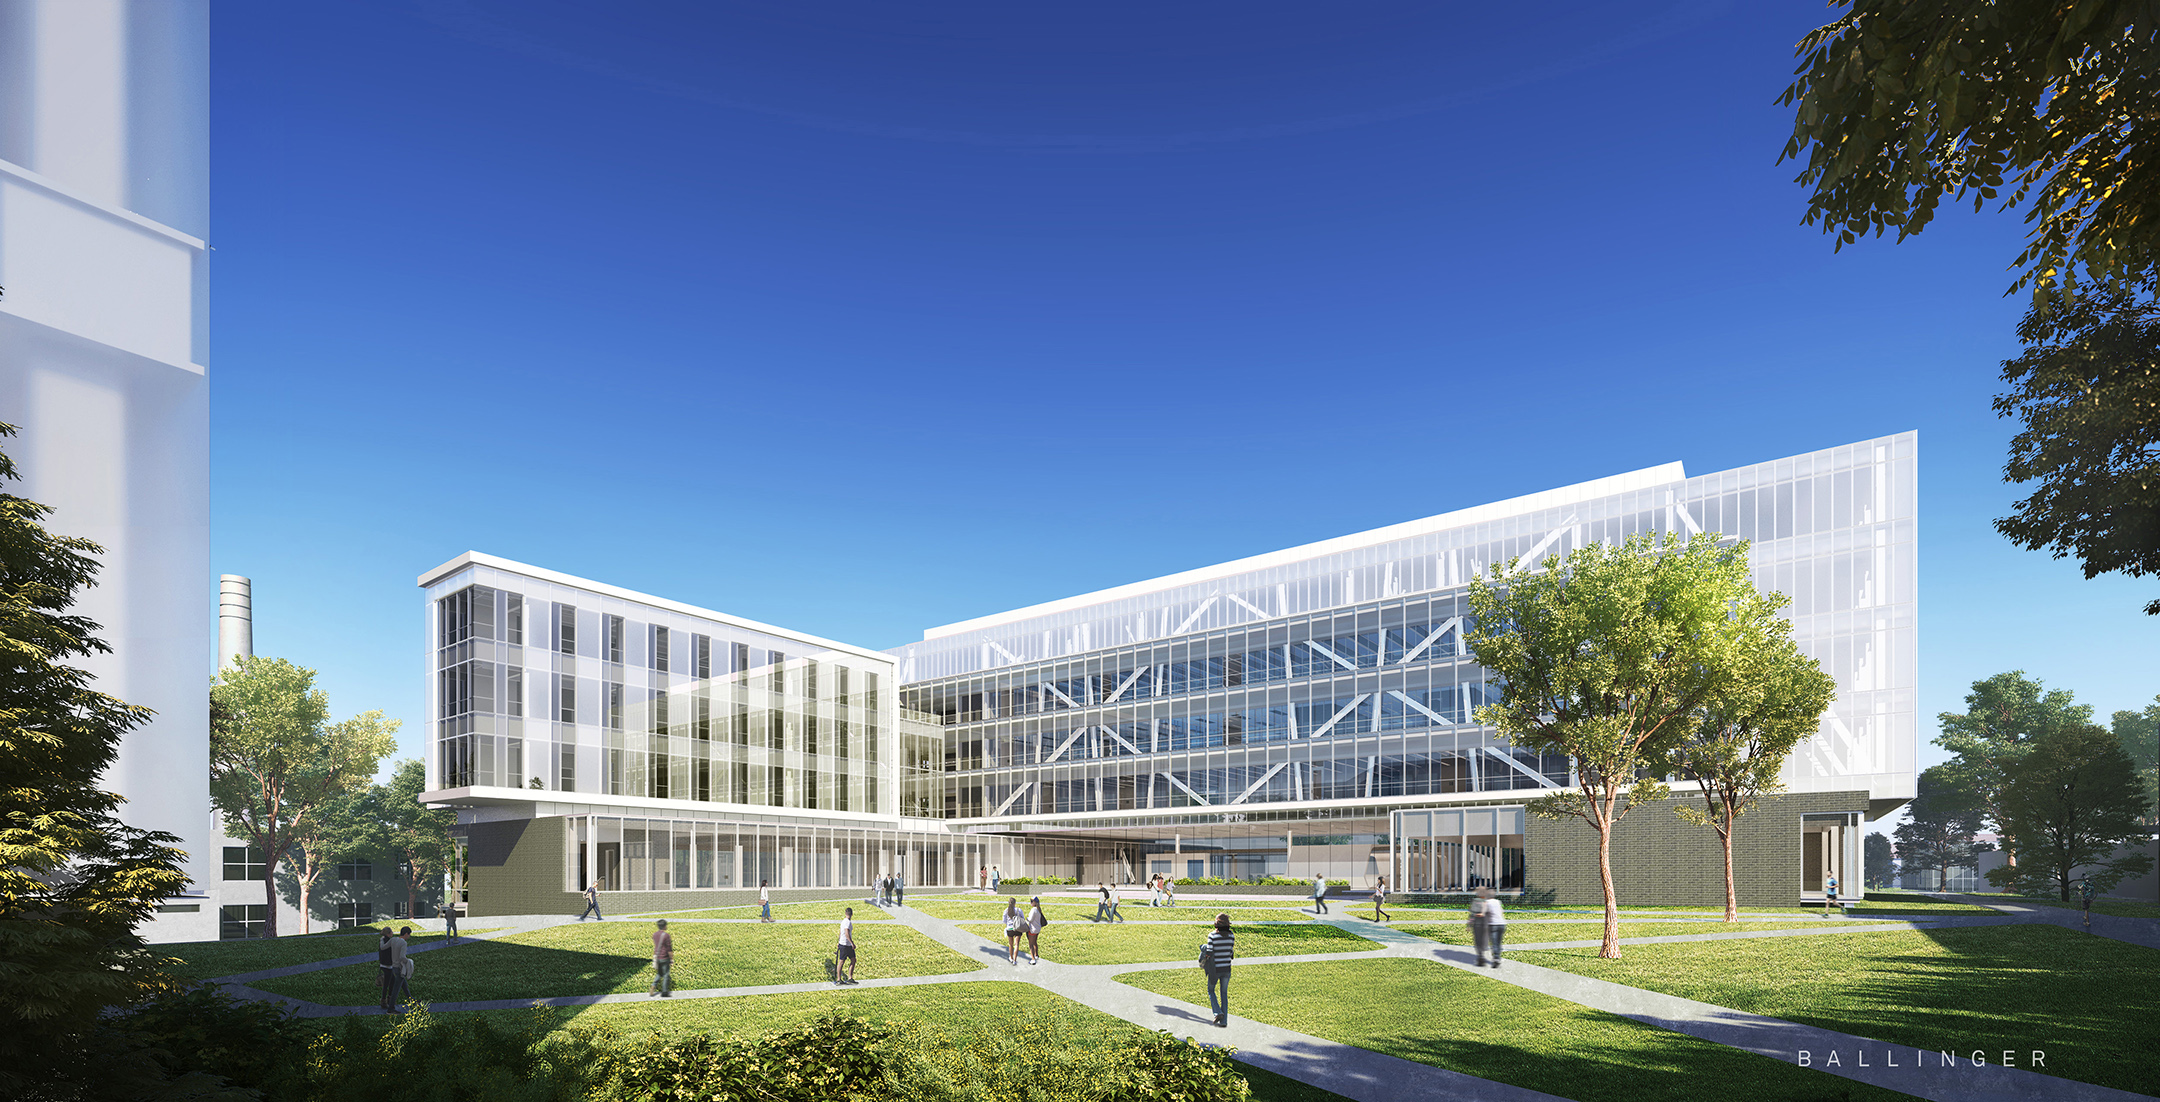 University of Rhode Island - New College of Engineering Building